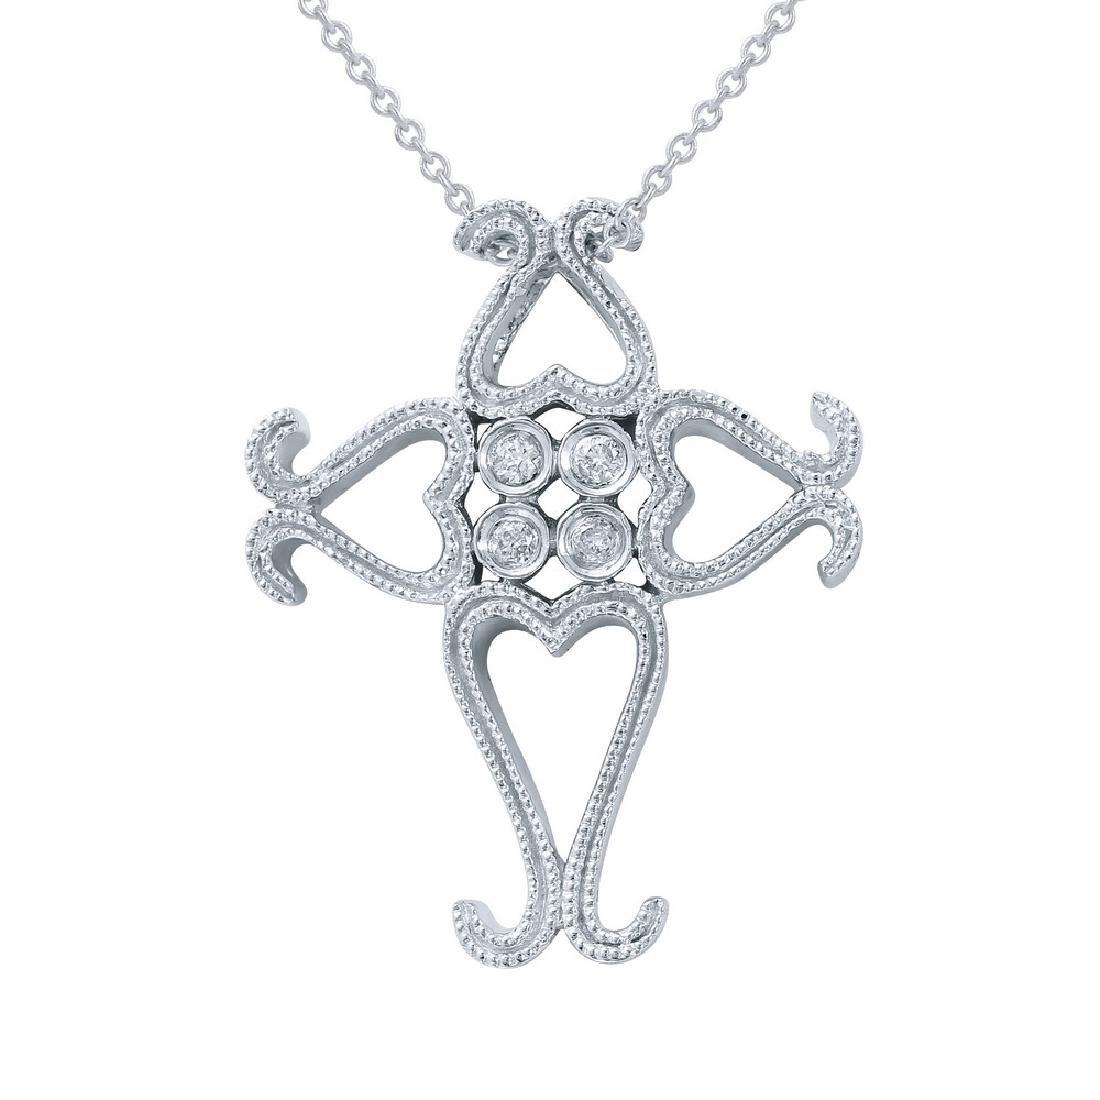 Genuine 0.07 TCW 14K White Gold Ladies Necklace